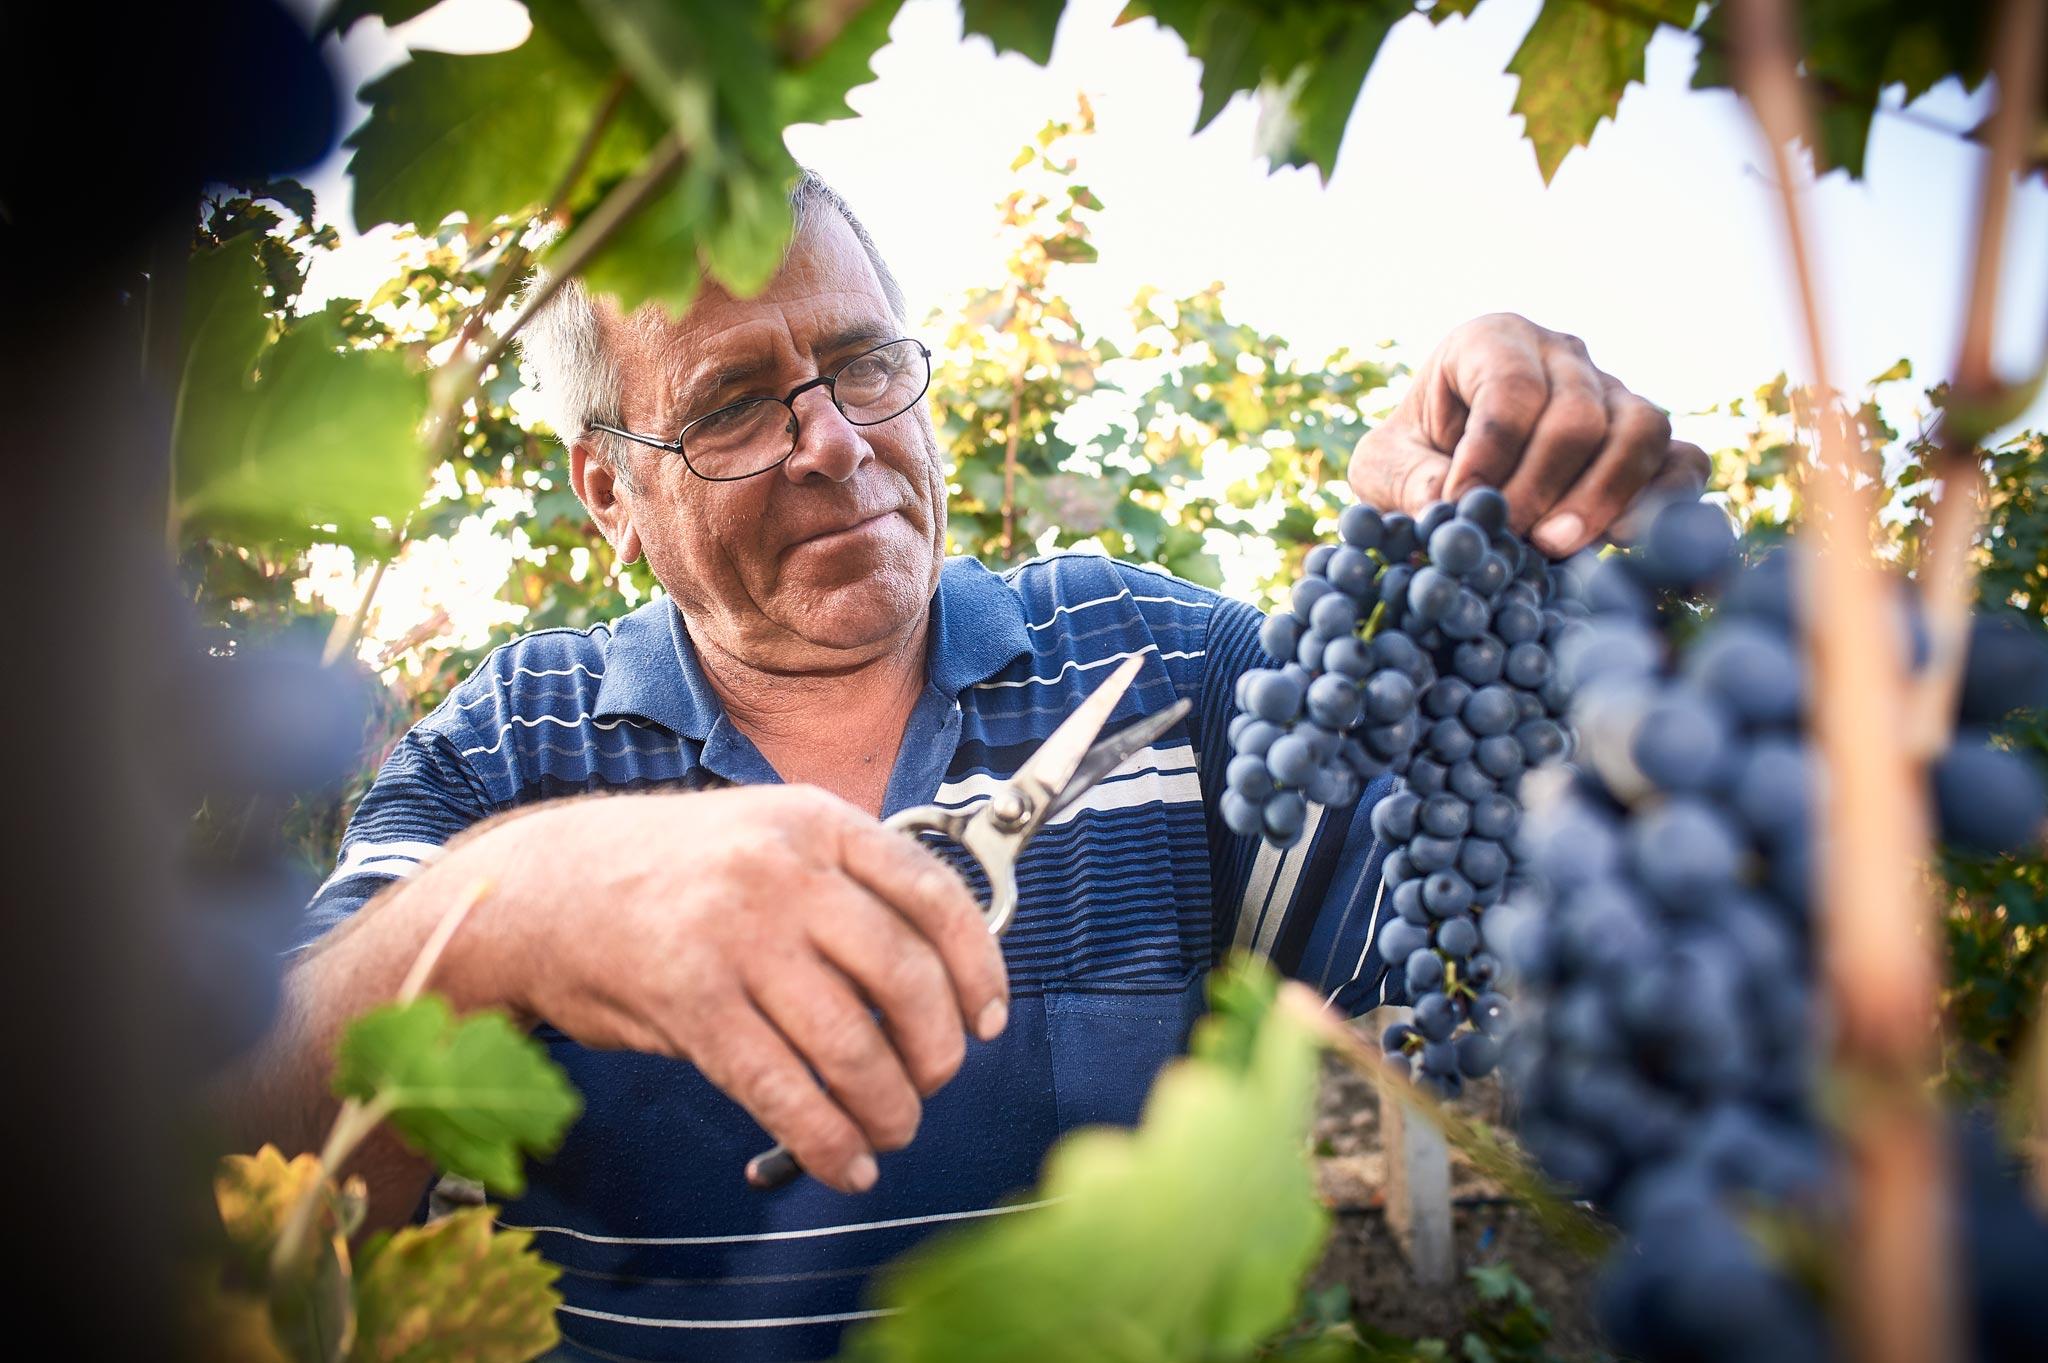 Vinogradnik Vasko Atanasov v vinogradu vranca